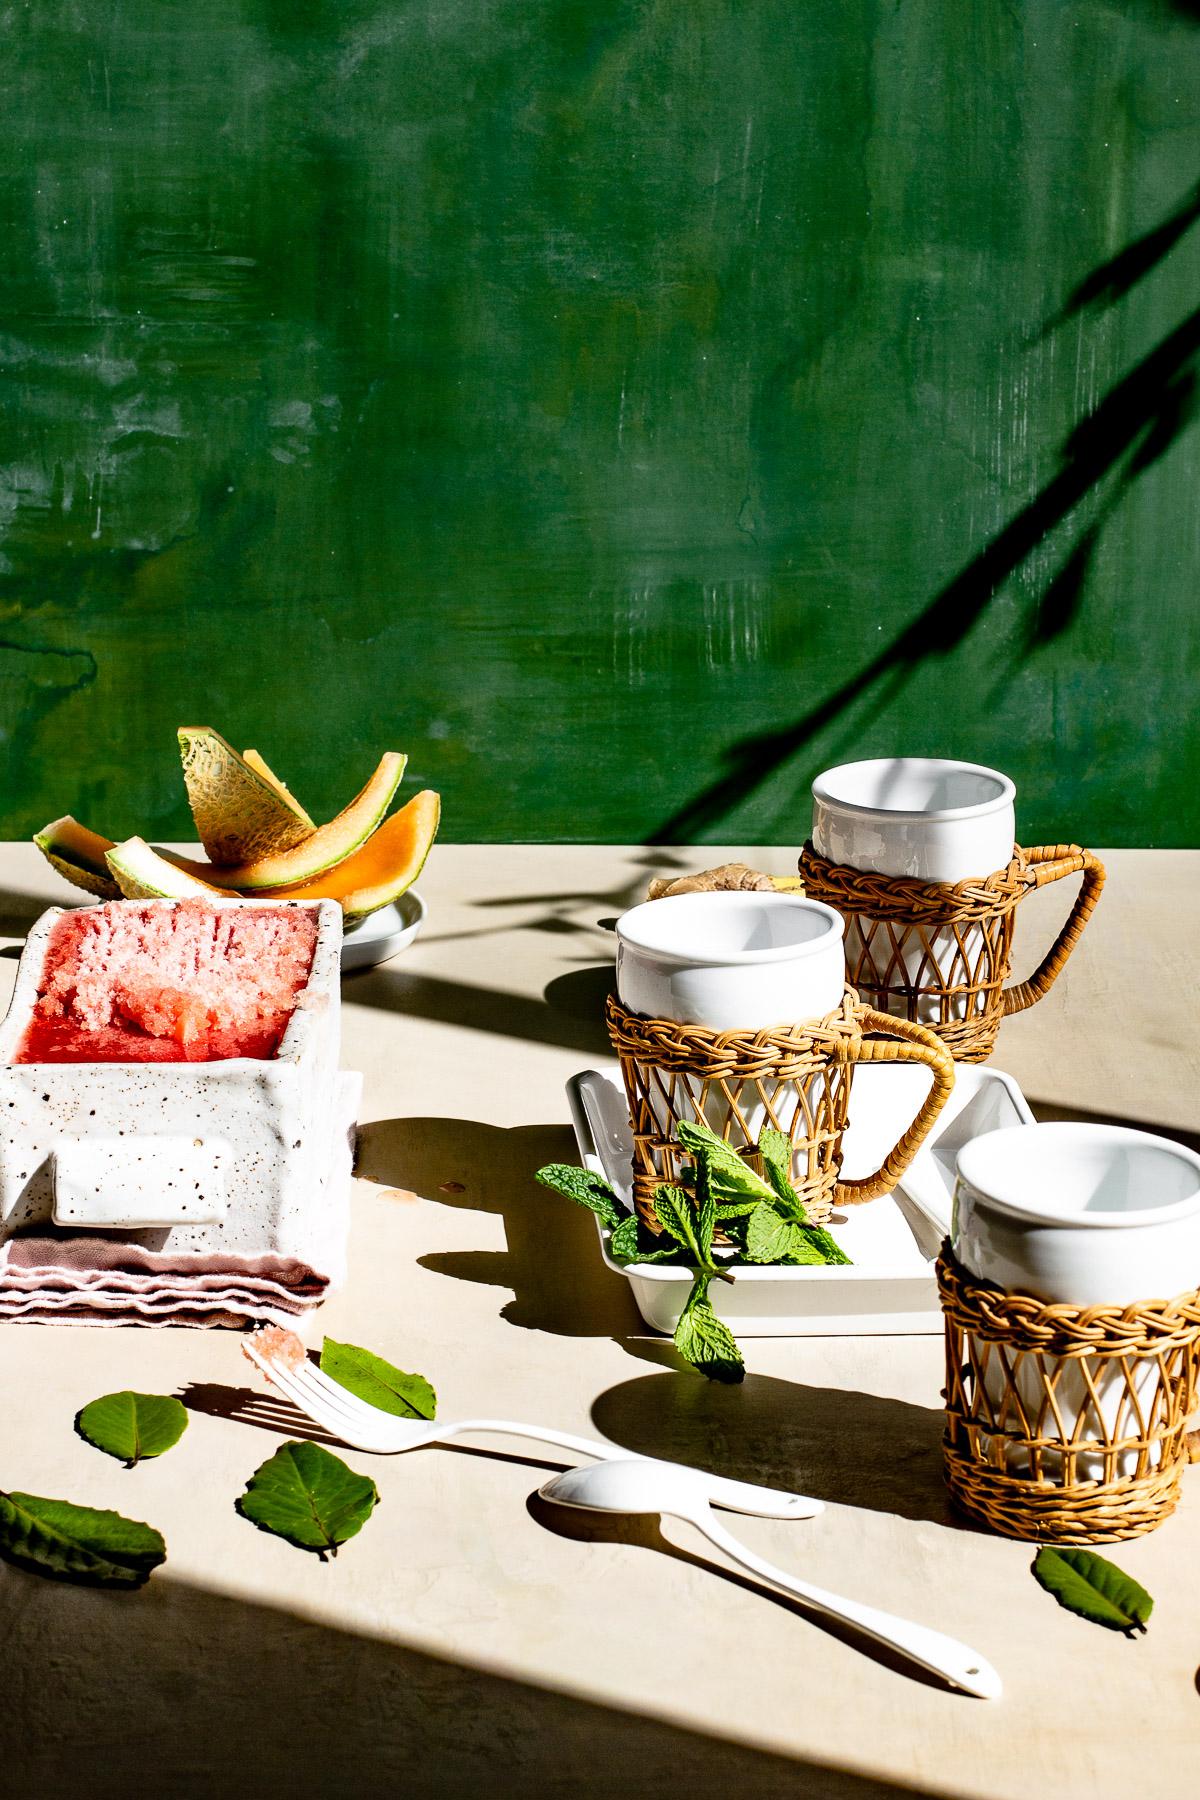 Tropical Fruit Ice Recipe